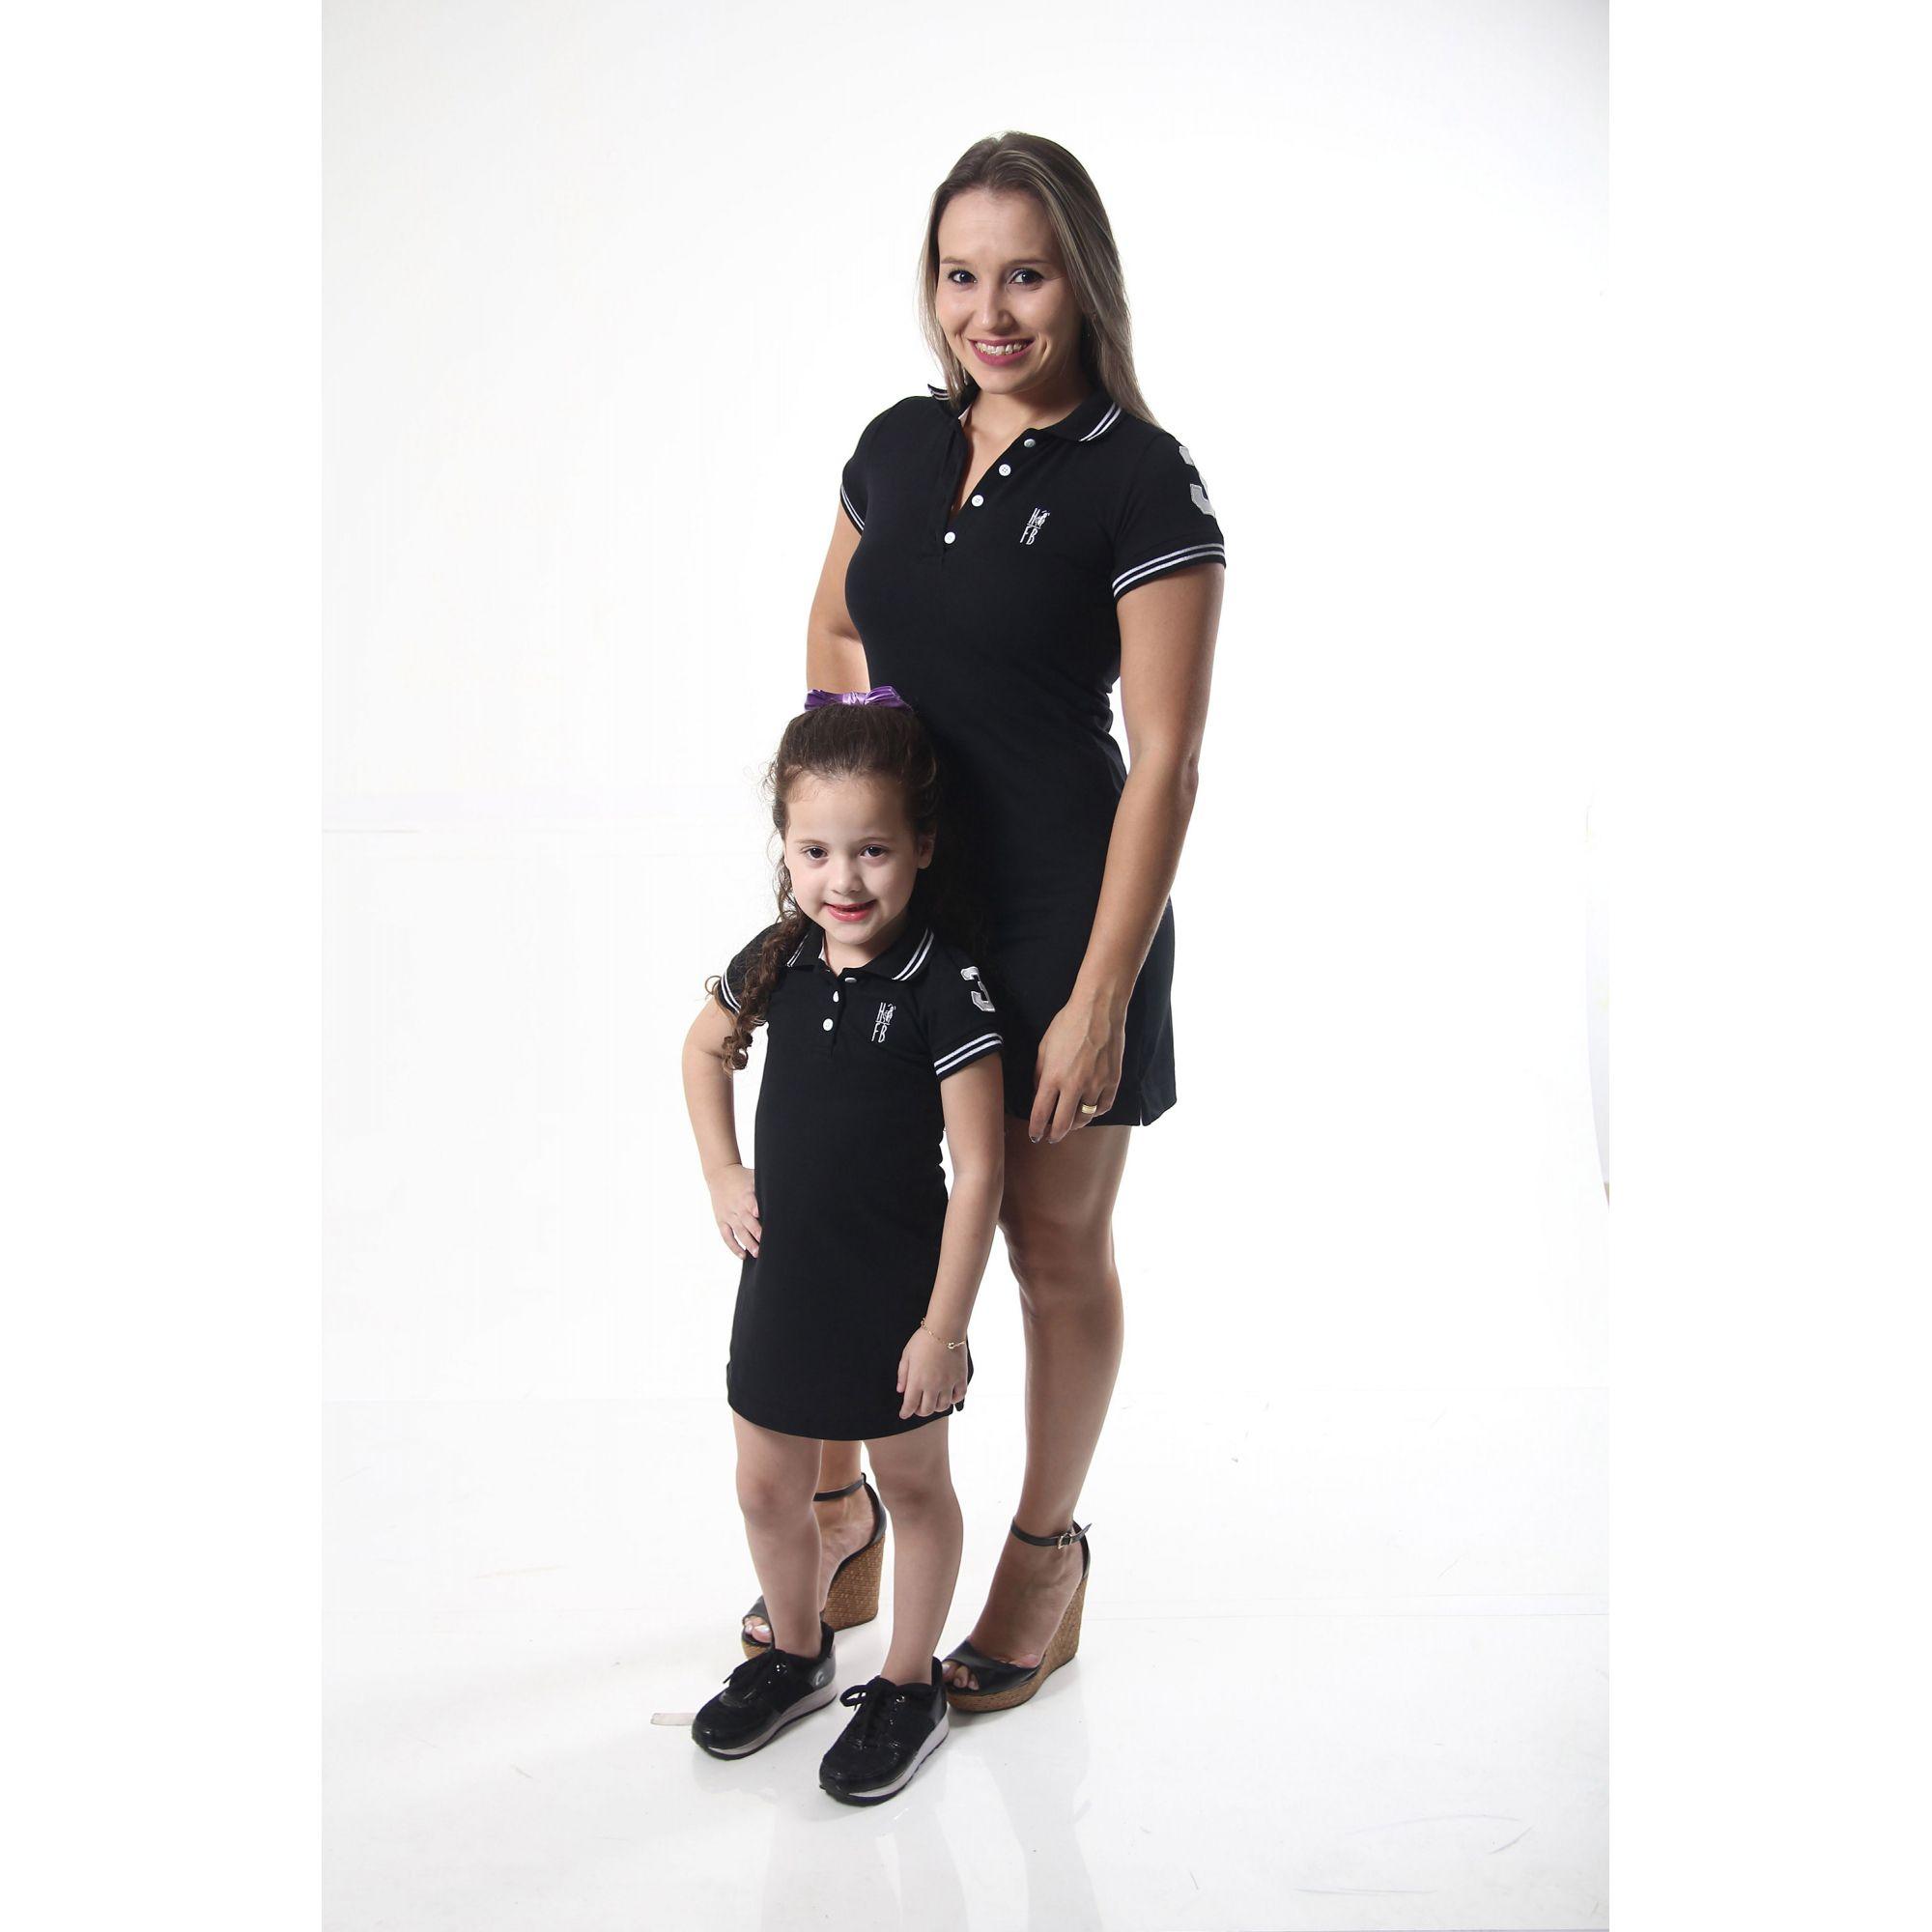 MÃE E FILHA > Kit 02 Vestidos Polo Preto Elegância [Coleção Tal Mãe Tal Filha]  - Heitor Fashion Brazil